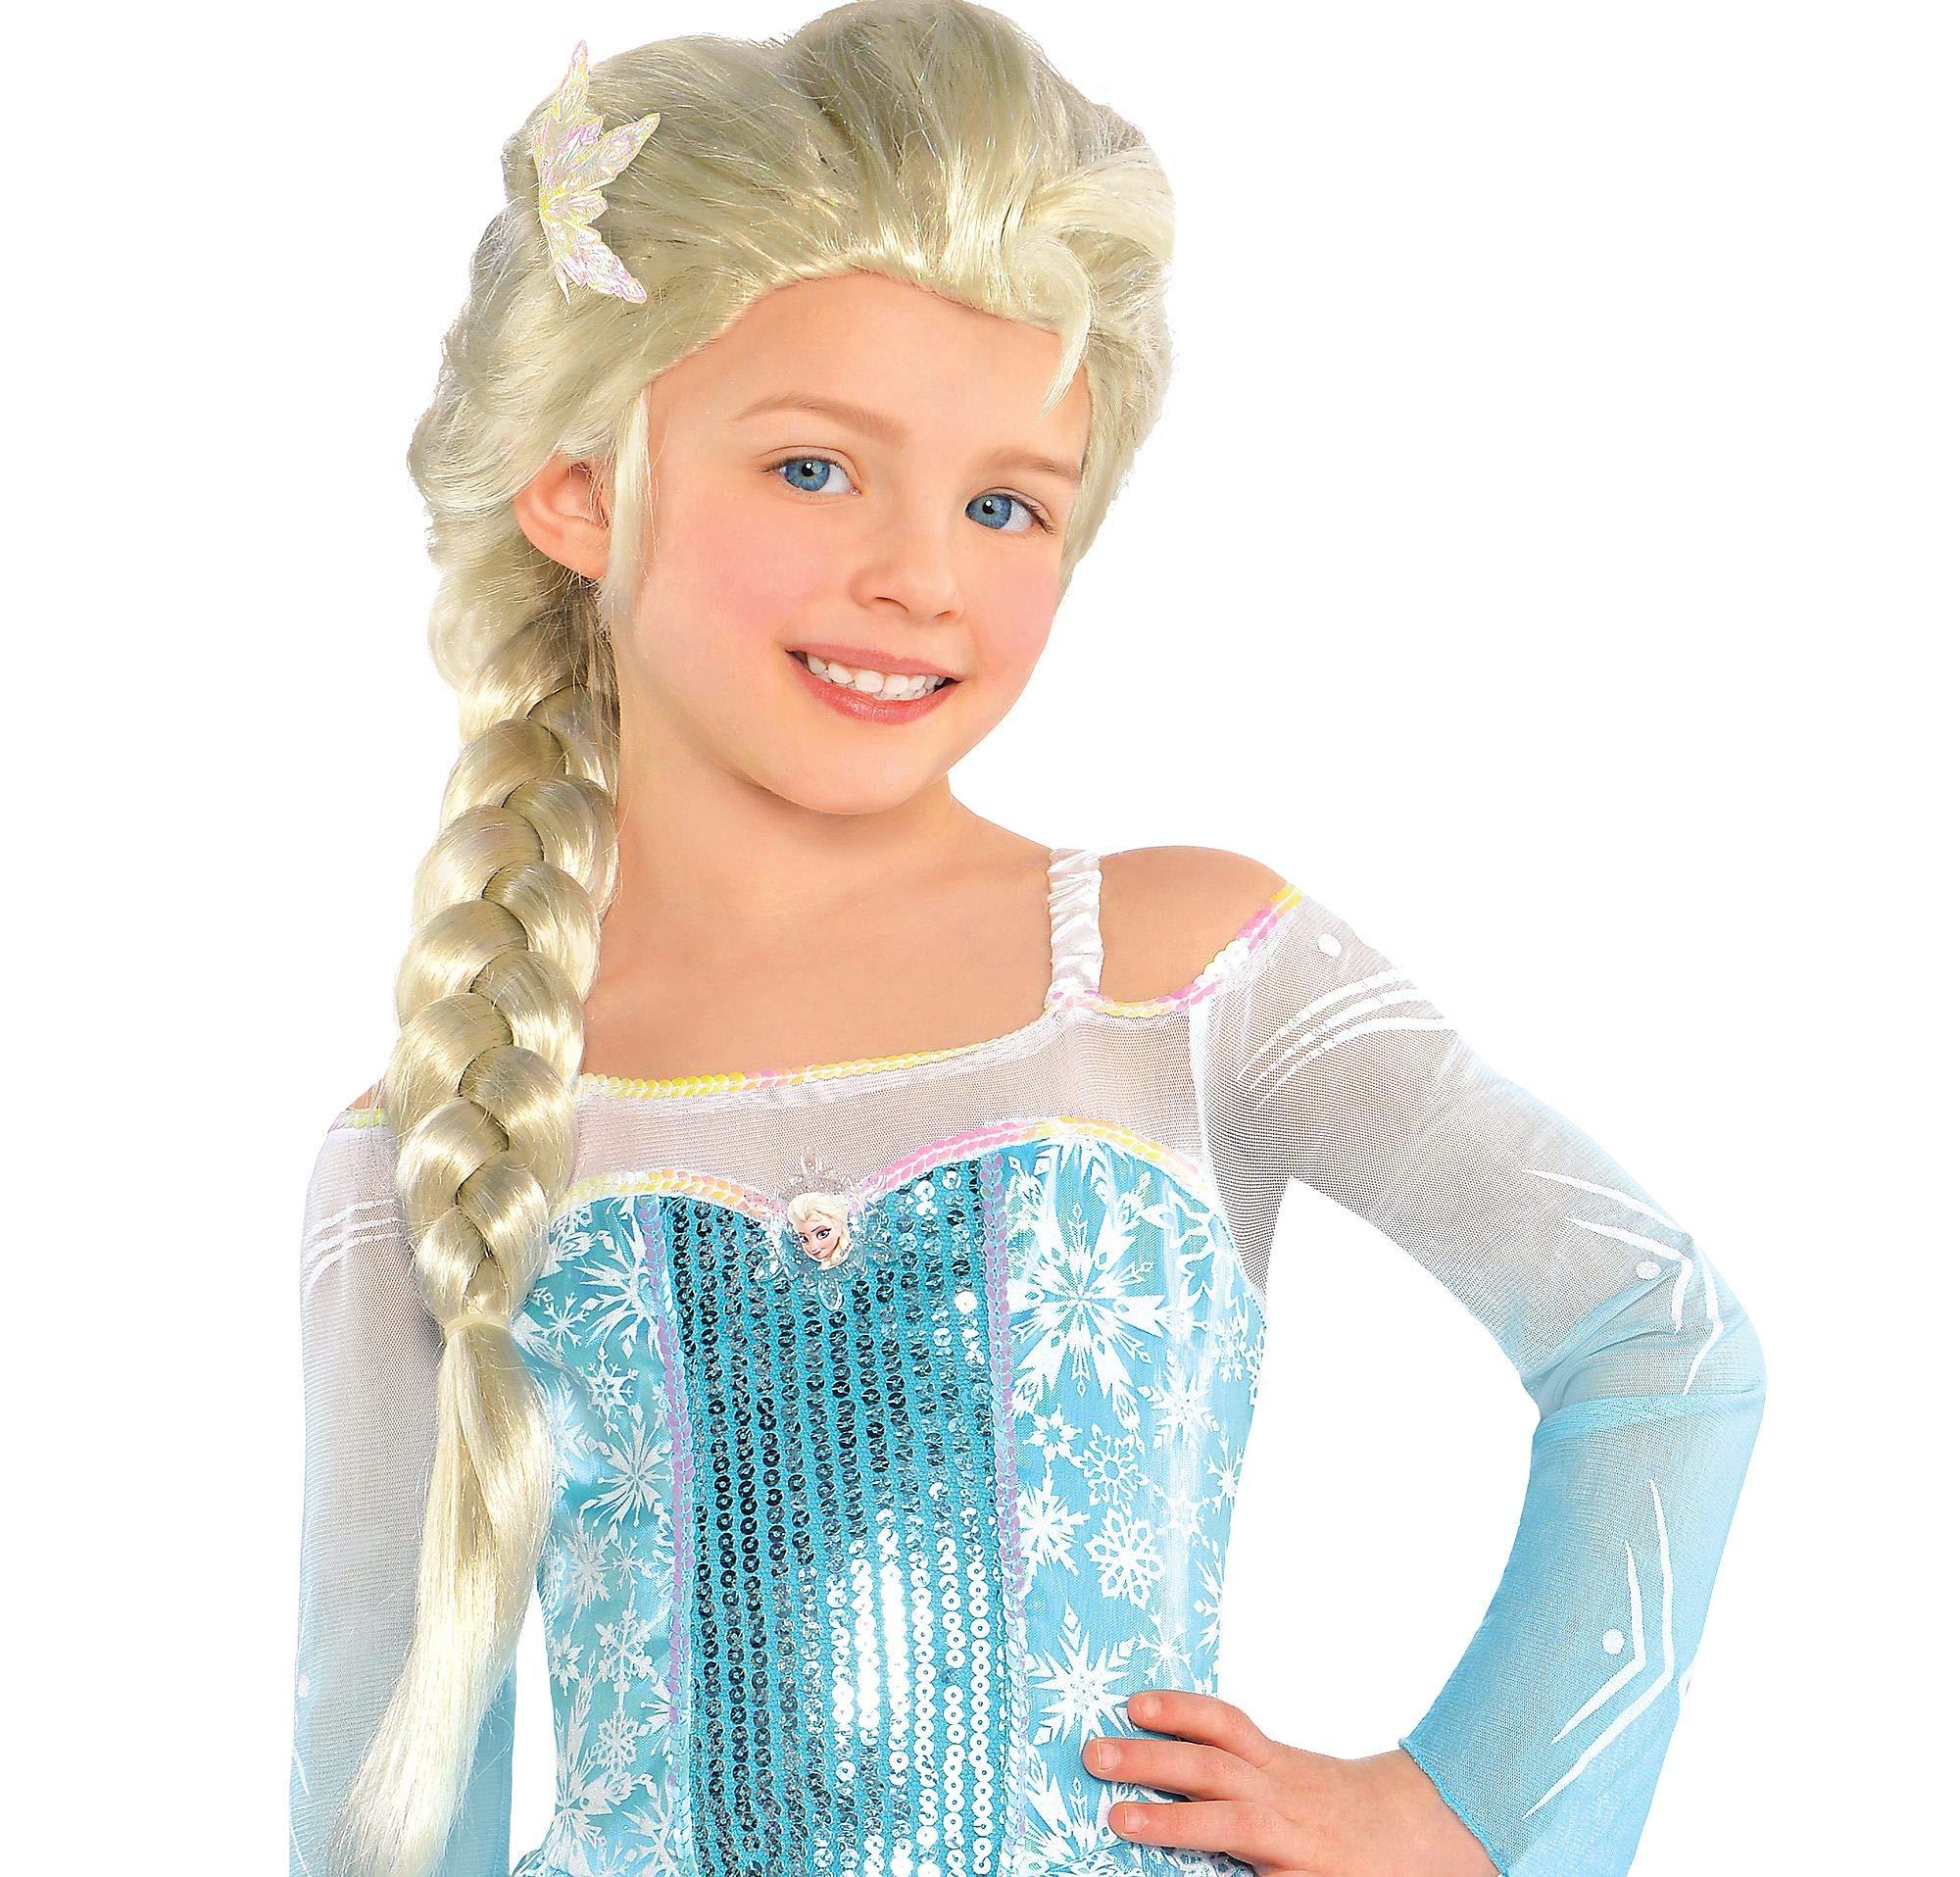 Child Disney Princess Movie Frozen Elsa The Snow Queen Braided Hair Costume Wig by Elsa Disguise